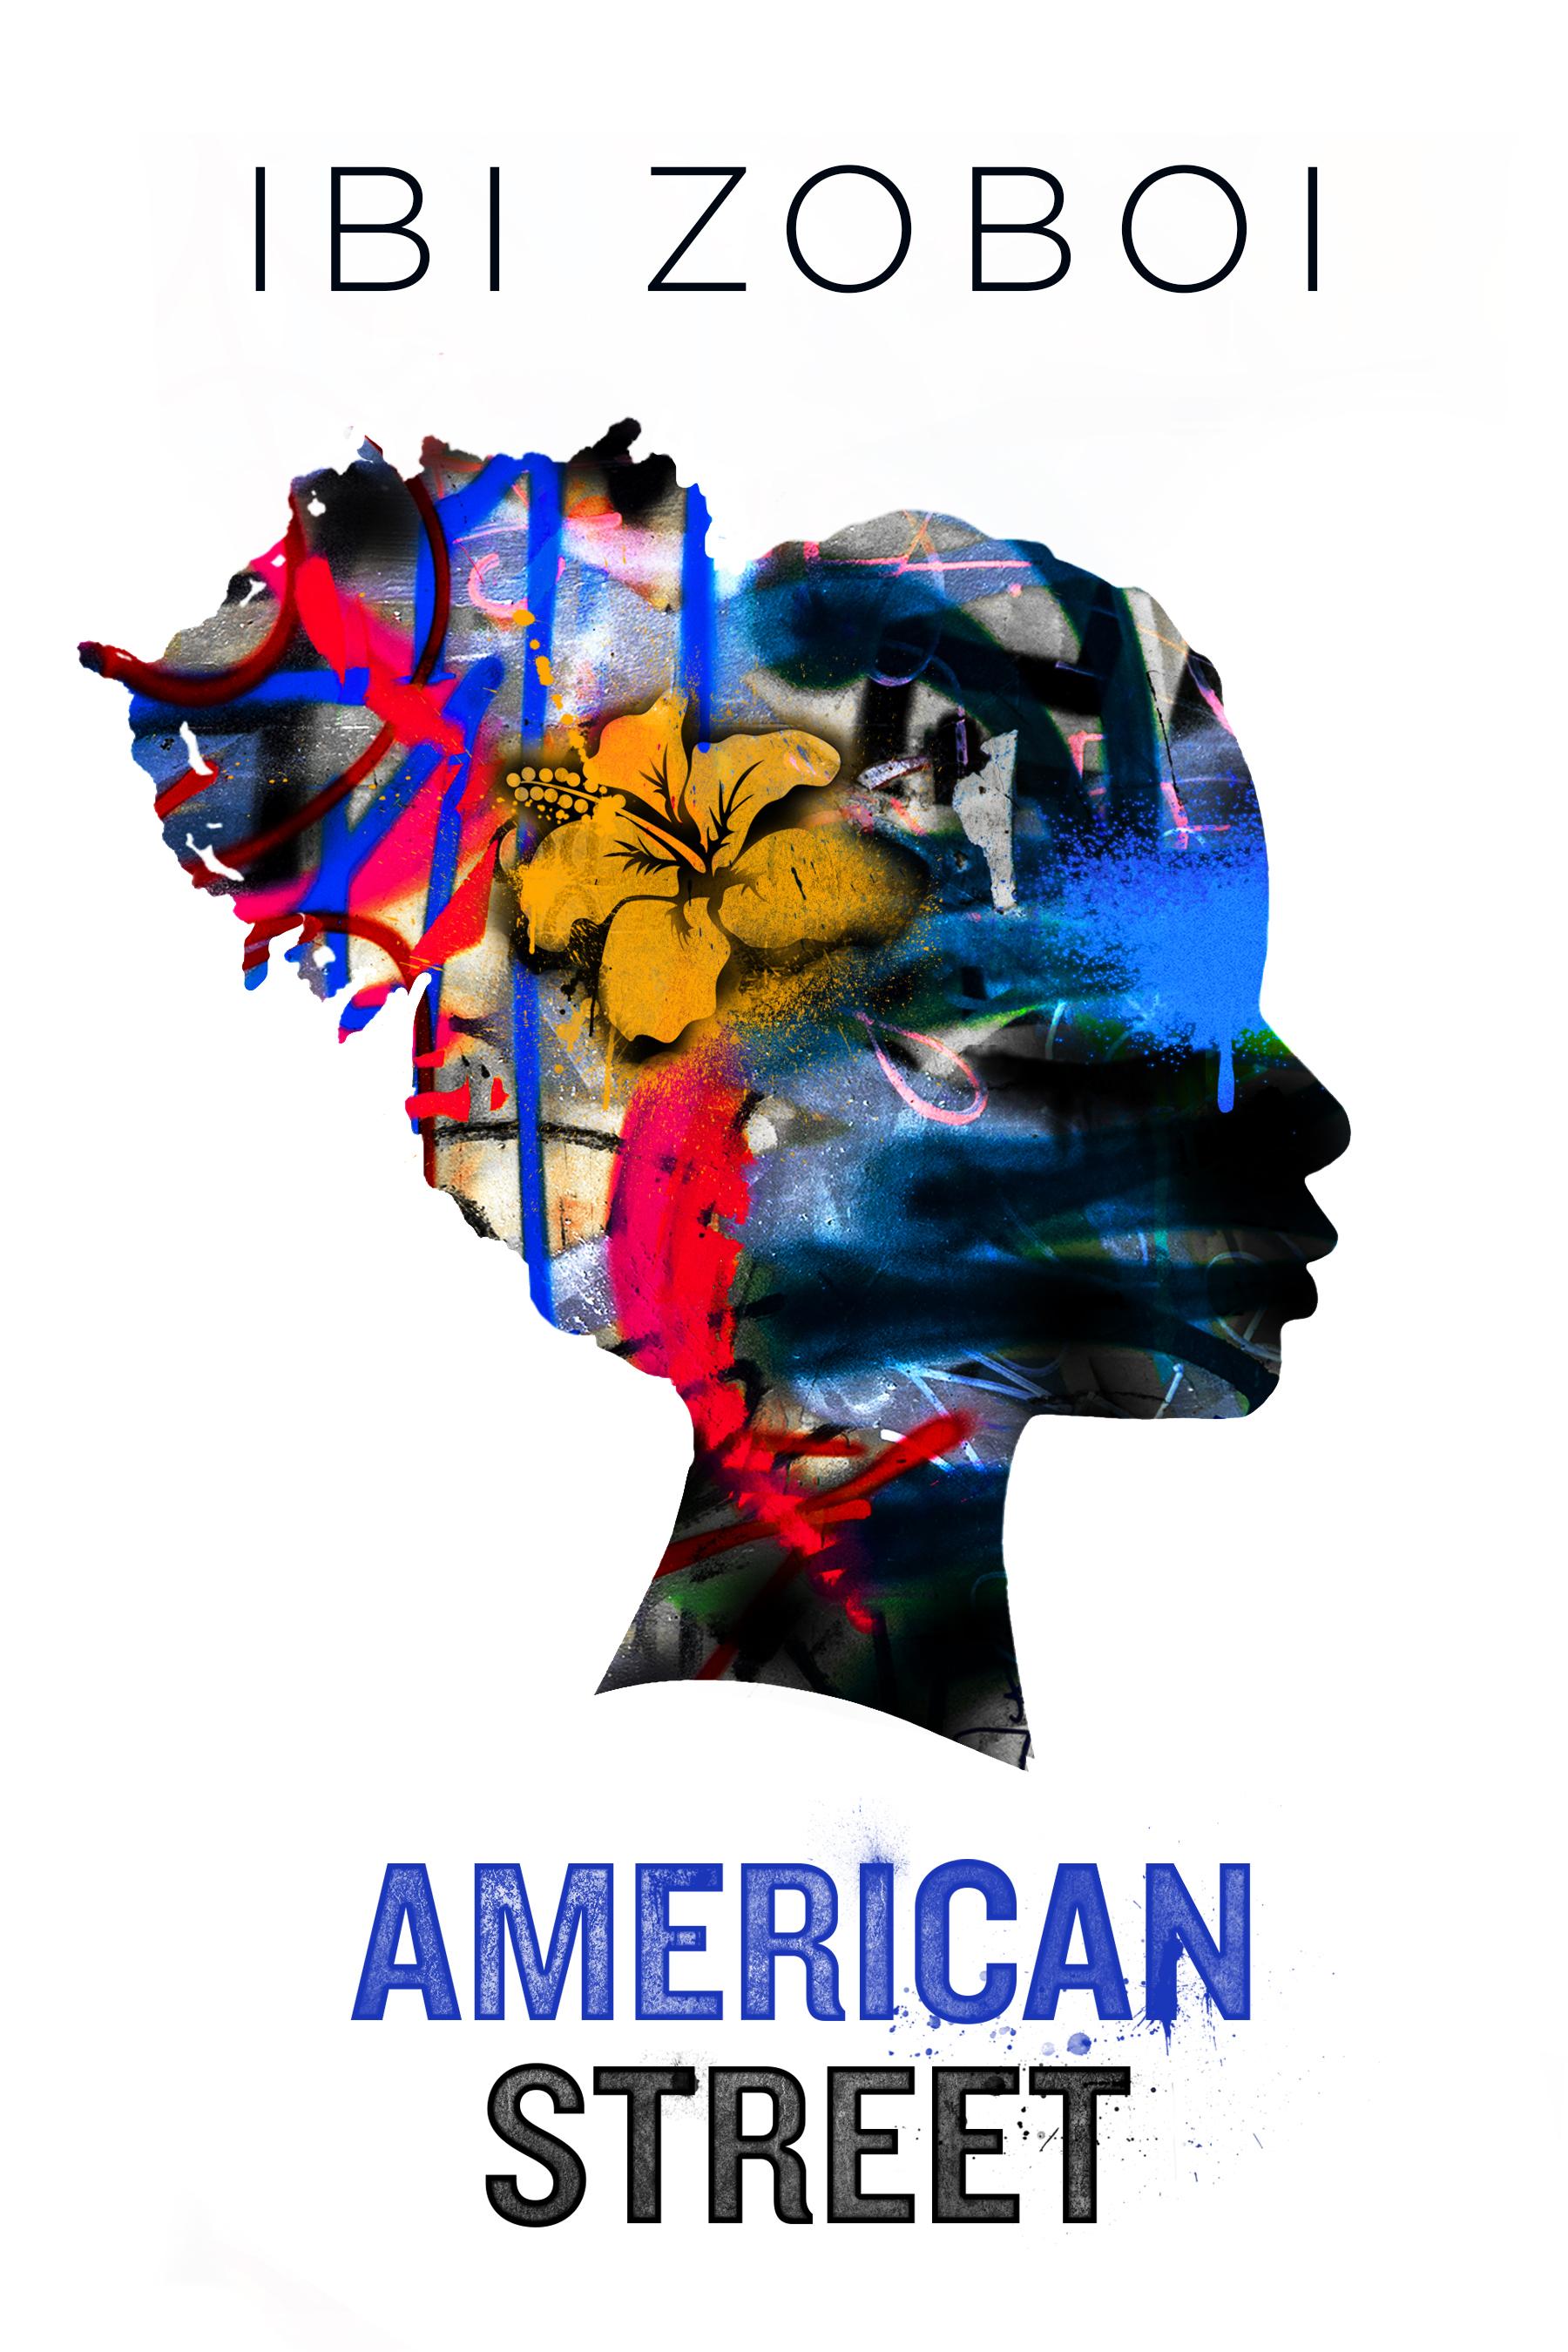 americanstreet_revised8